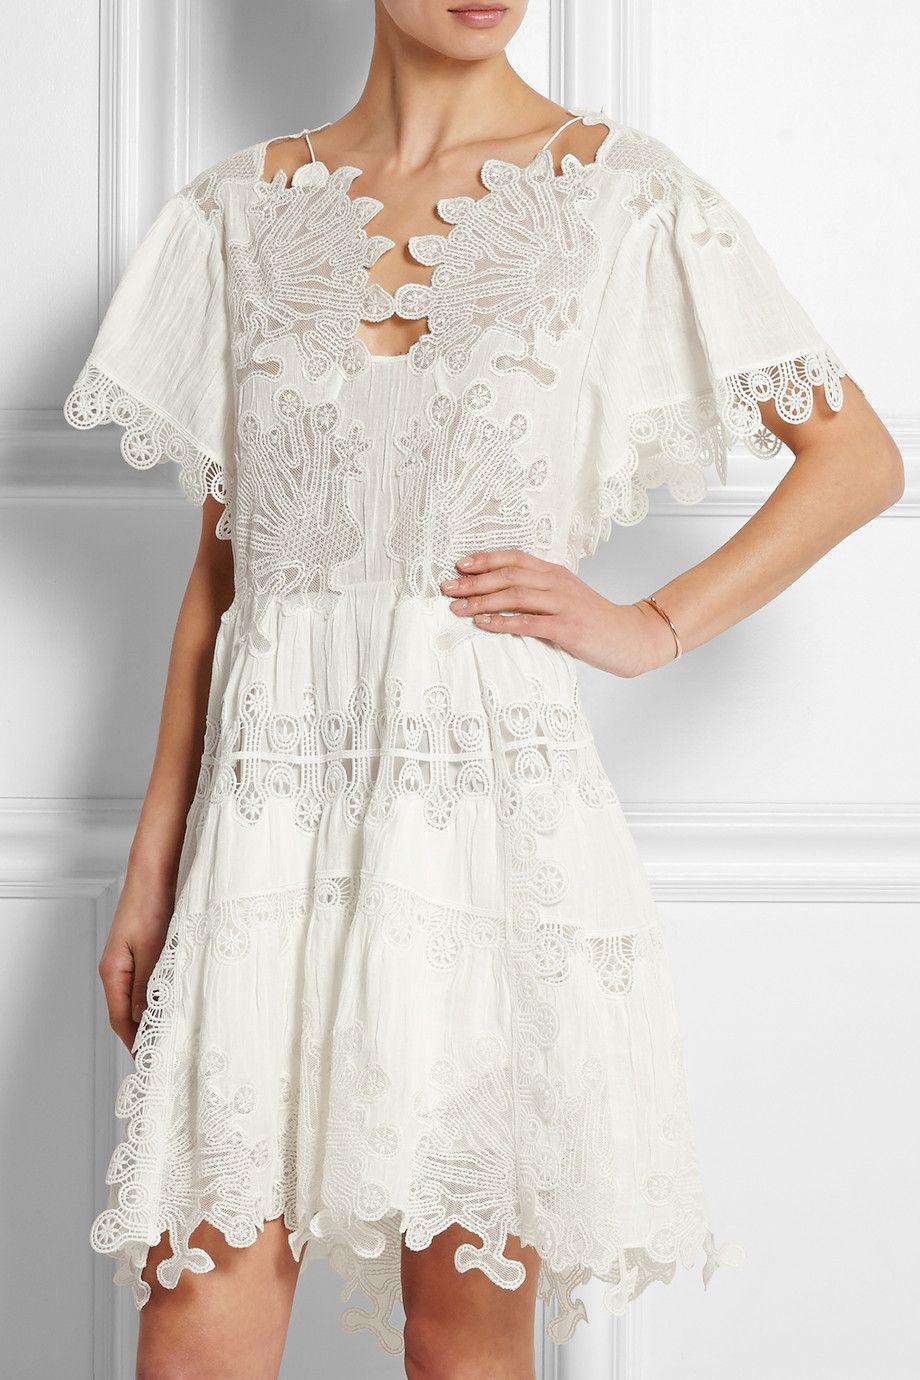 Chloe Guipure Lace And Plisse Muslin Dress [ 1380 x 920 Pixel ]